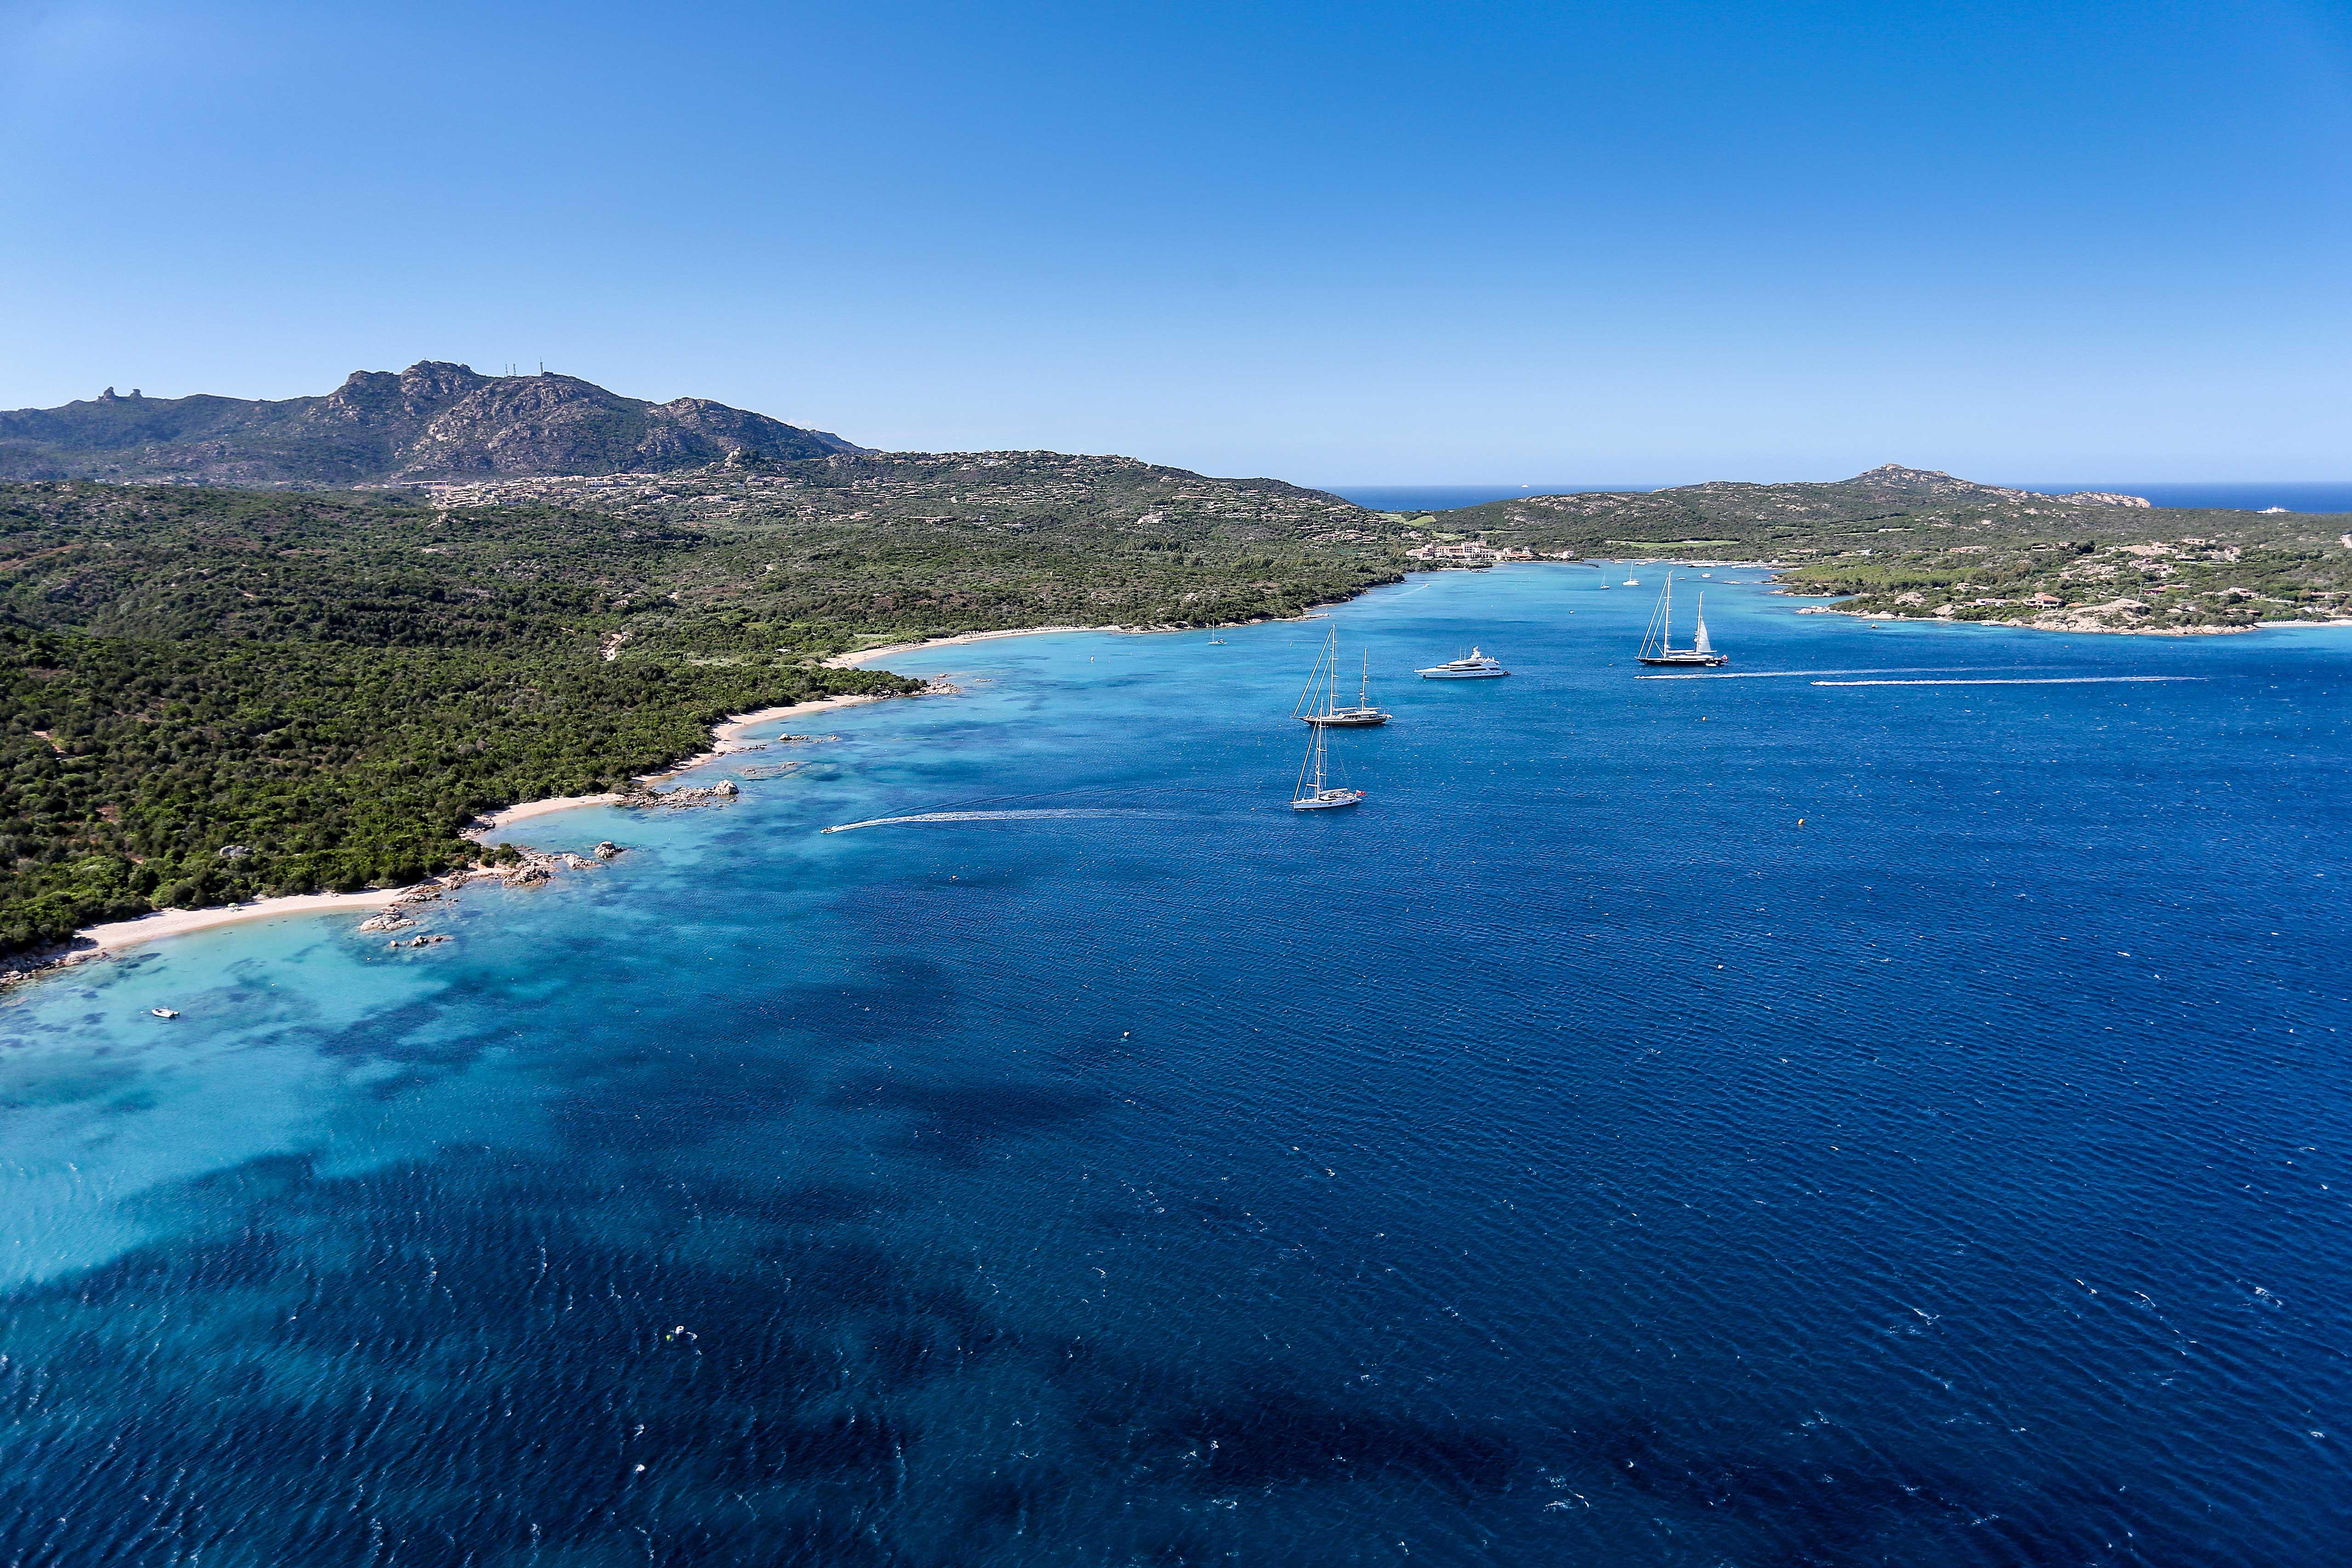 Sardegna e territorio foto aeree 96